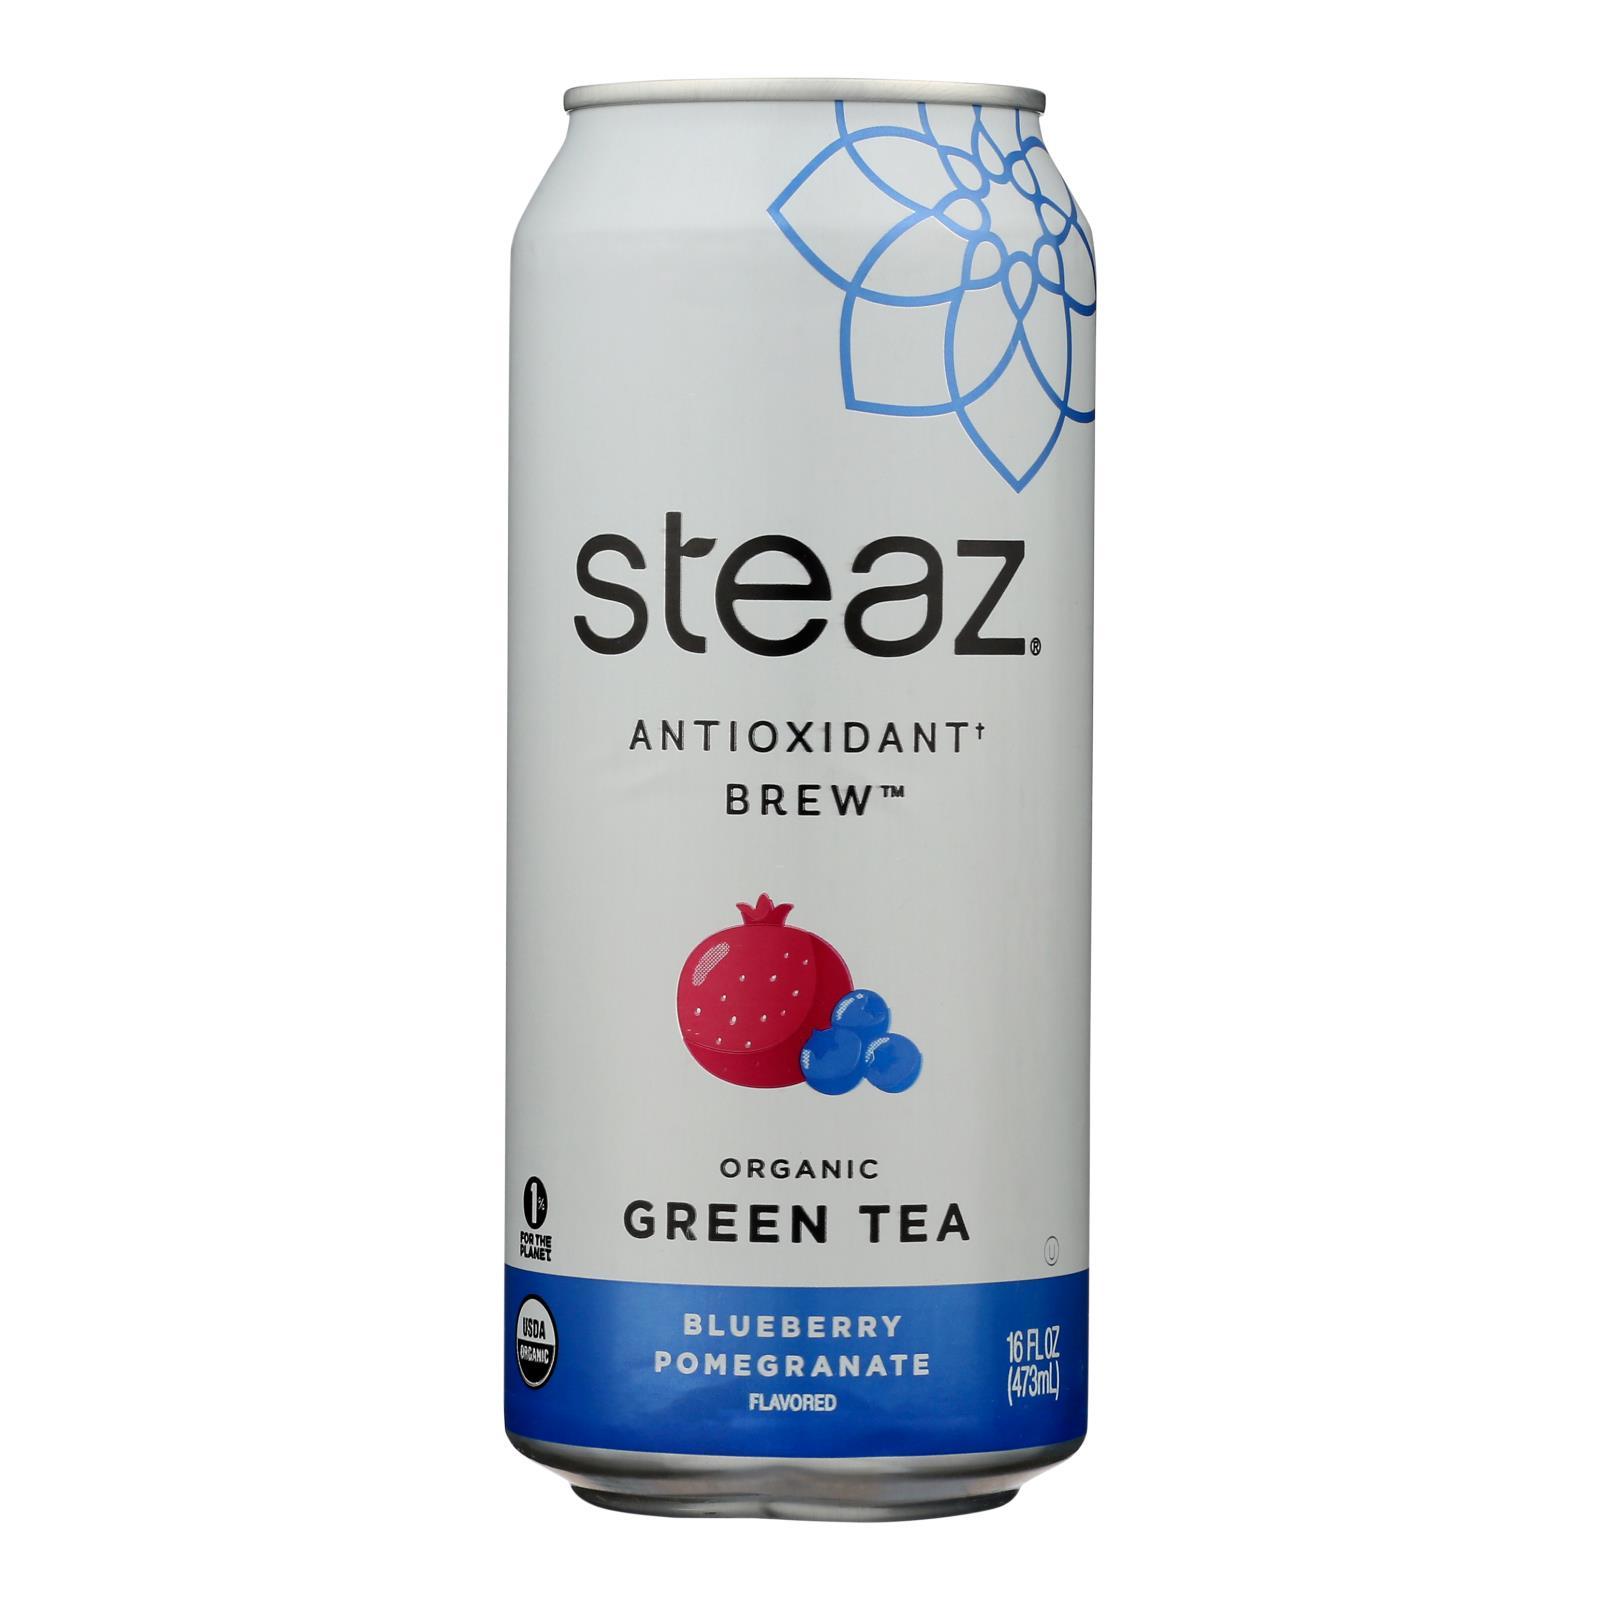 Steaz Lightly Sweetened Green Tea - Blueberry Pomegranate - Case of 12 - 16 Fl oz.